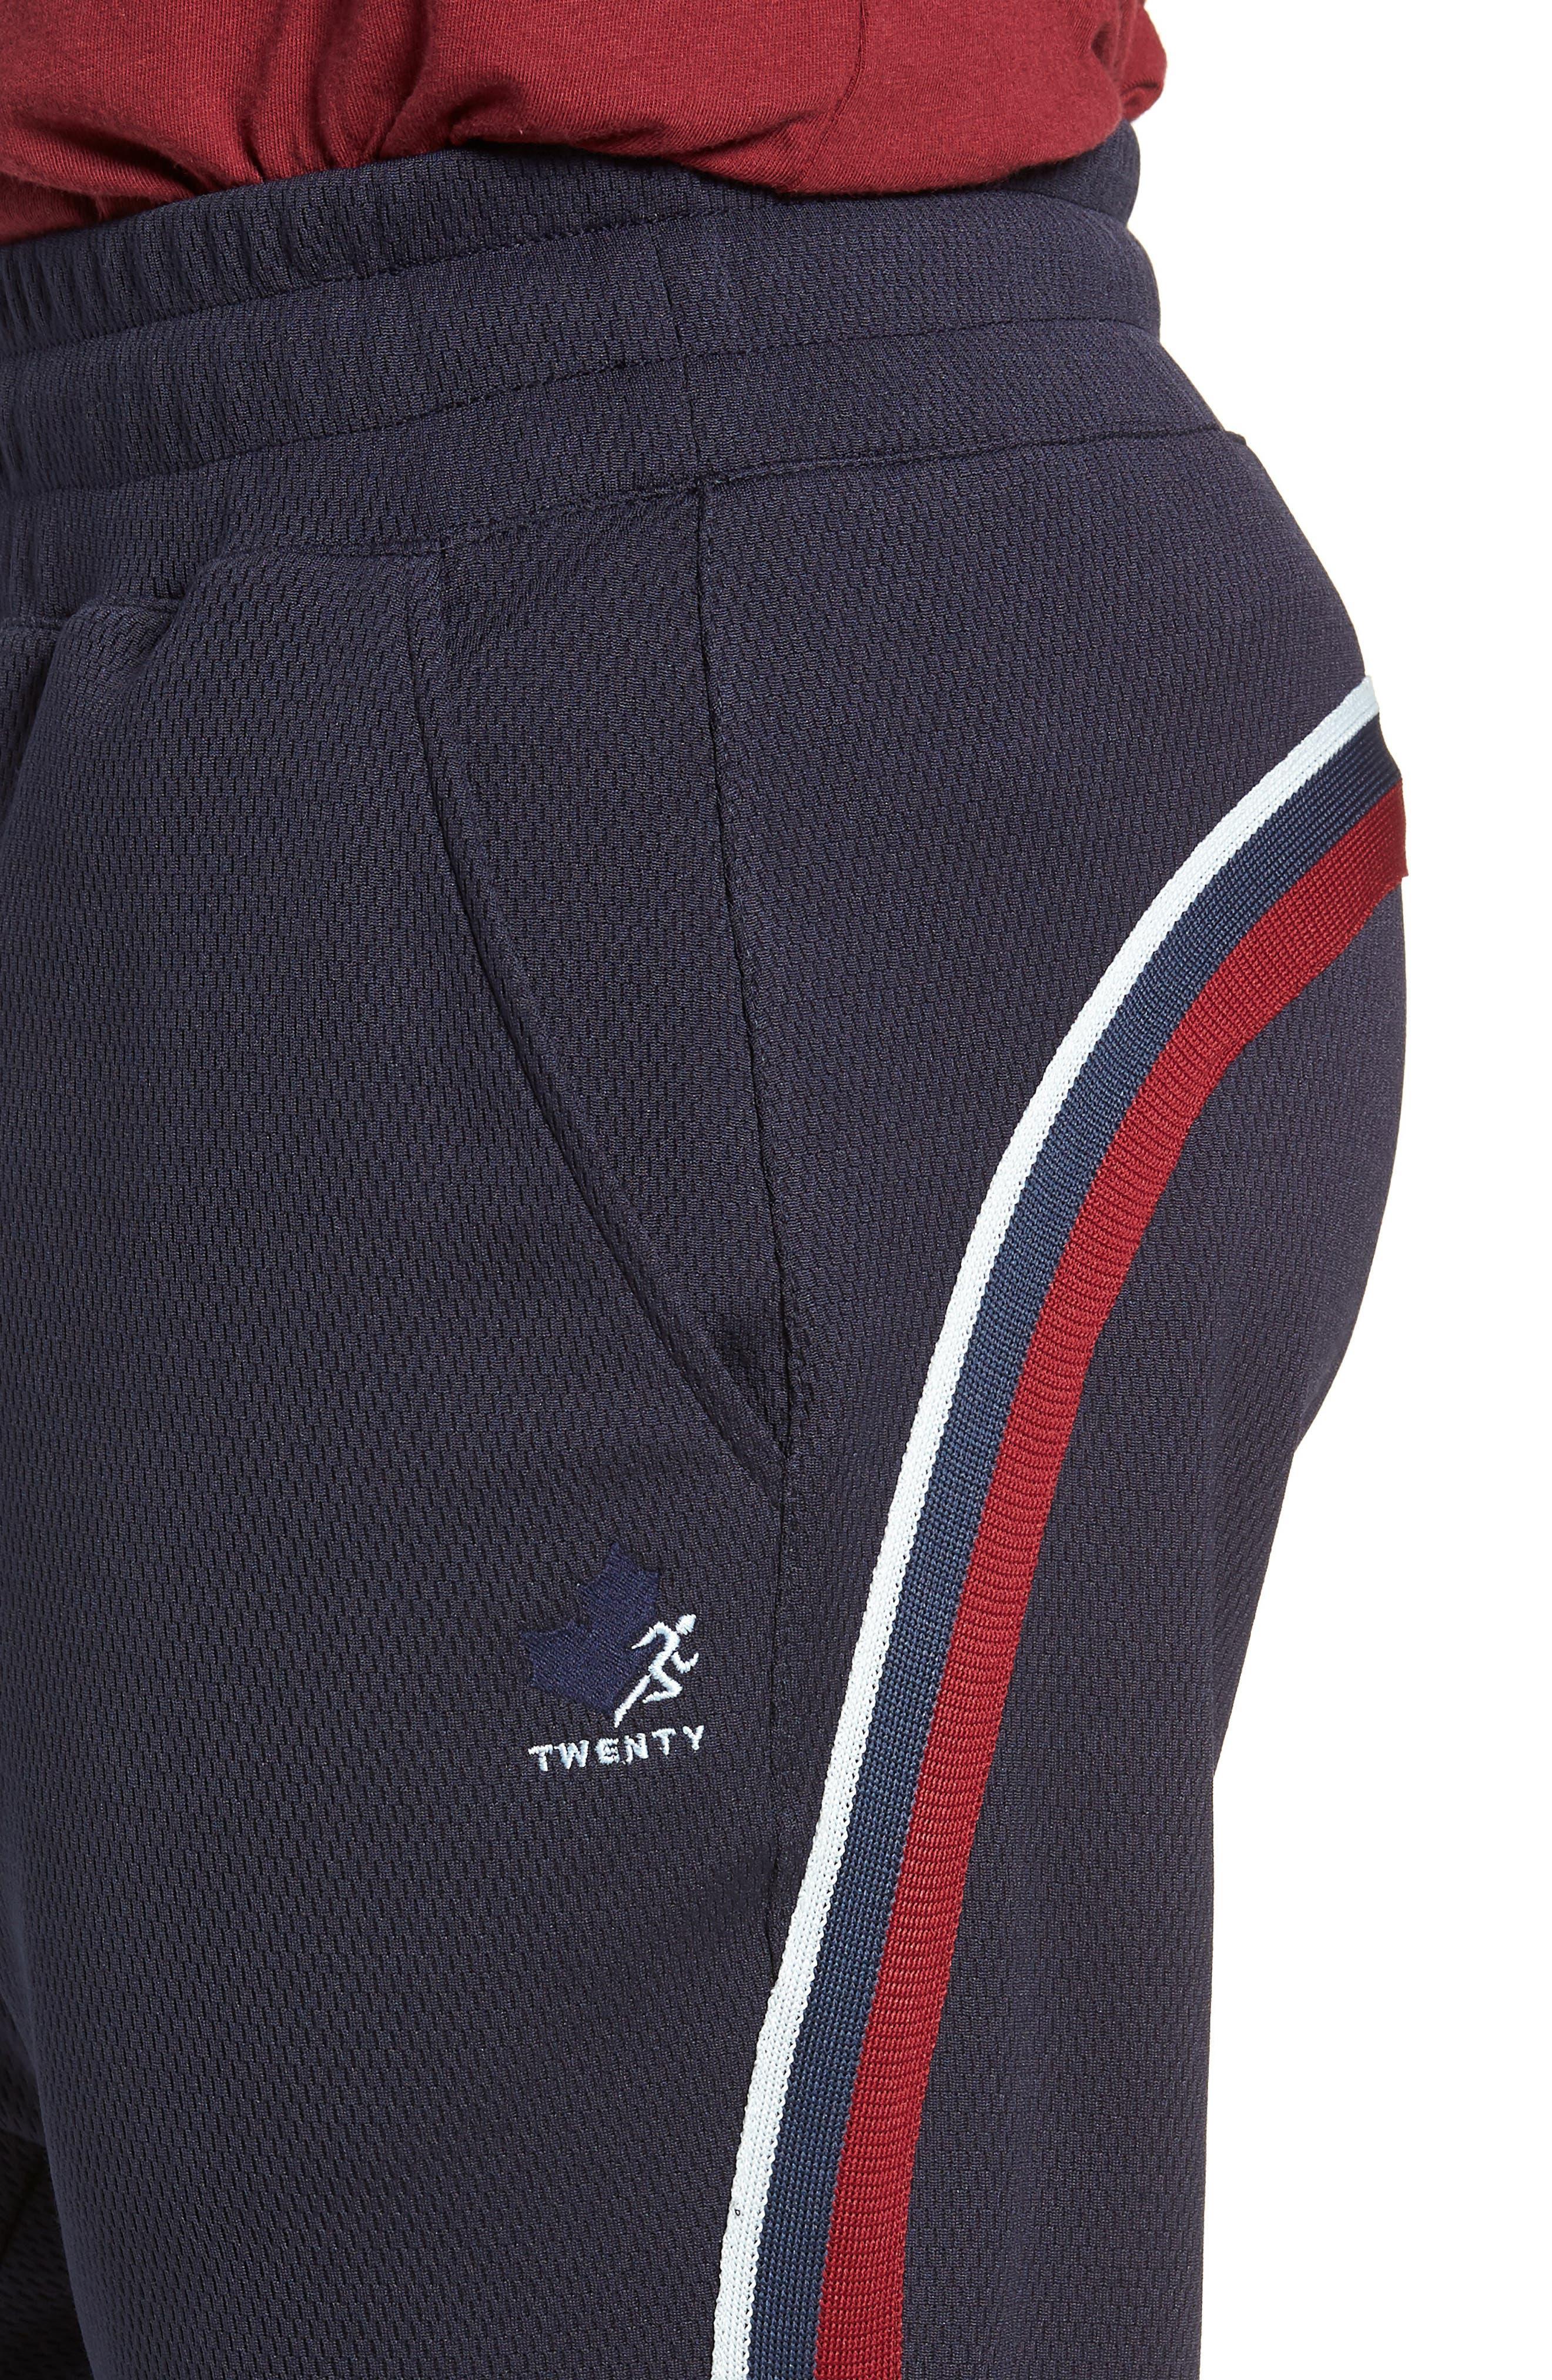 Slim Fit Track Pants,                             Alternate thumbnail 4, color,                             ADMIRAL